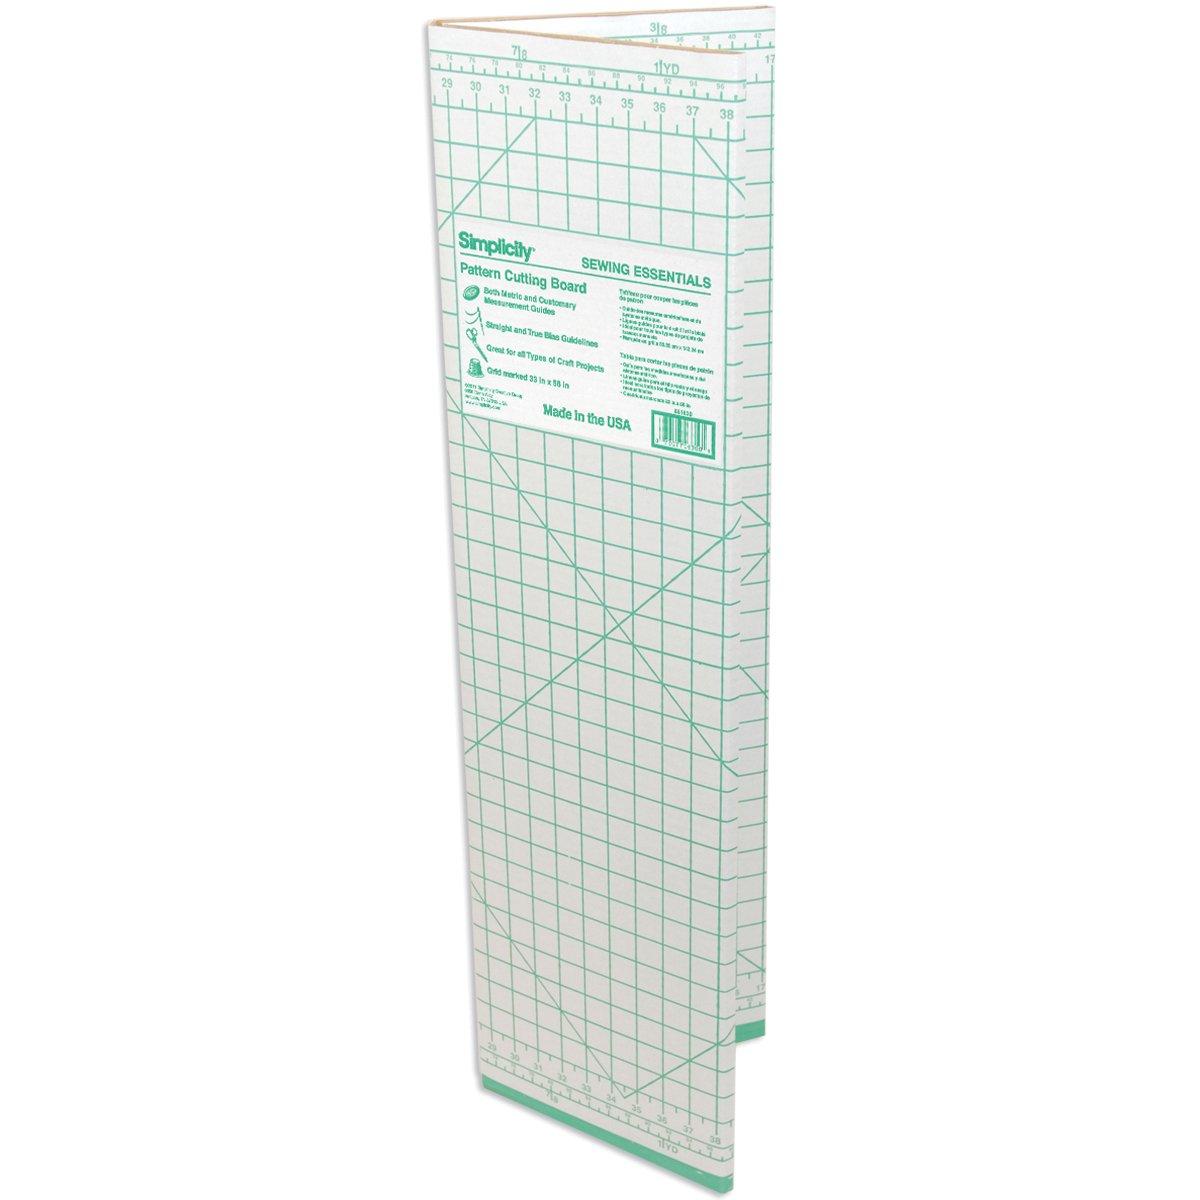 "Wrights 881630 Cardboard Pattern Cutting Board, 36""x60"" 36""x60"" Notions - In Network"